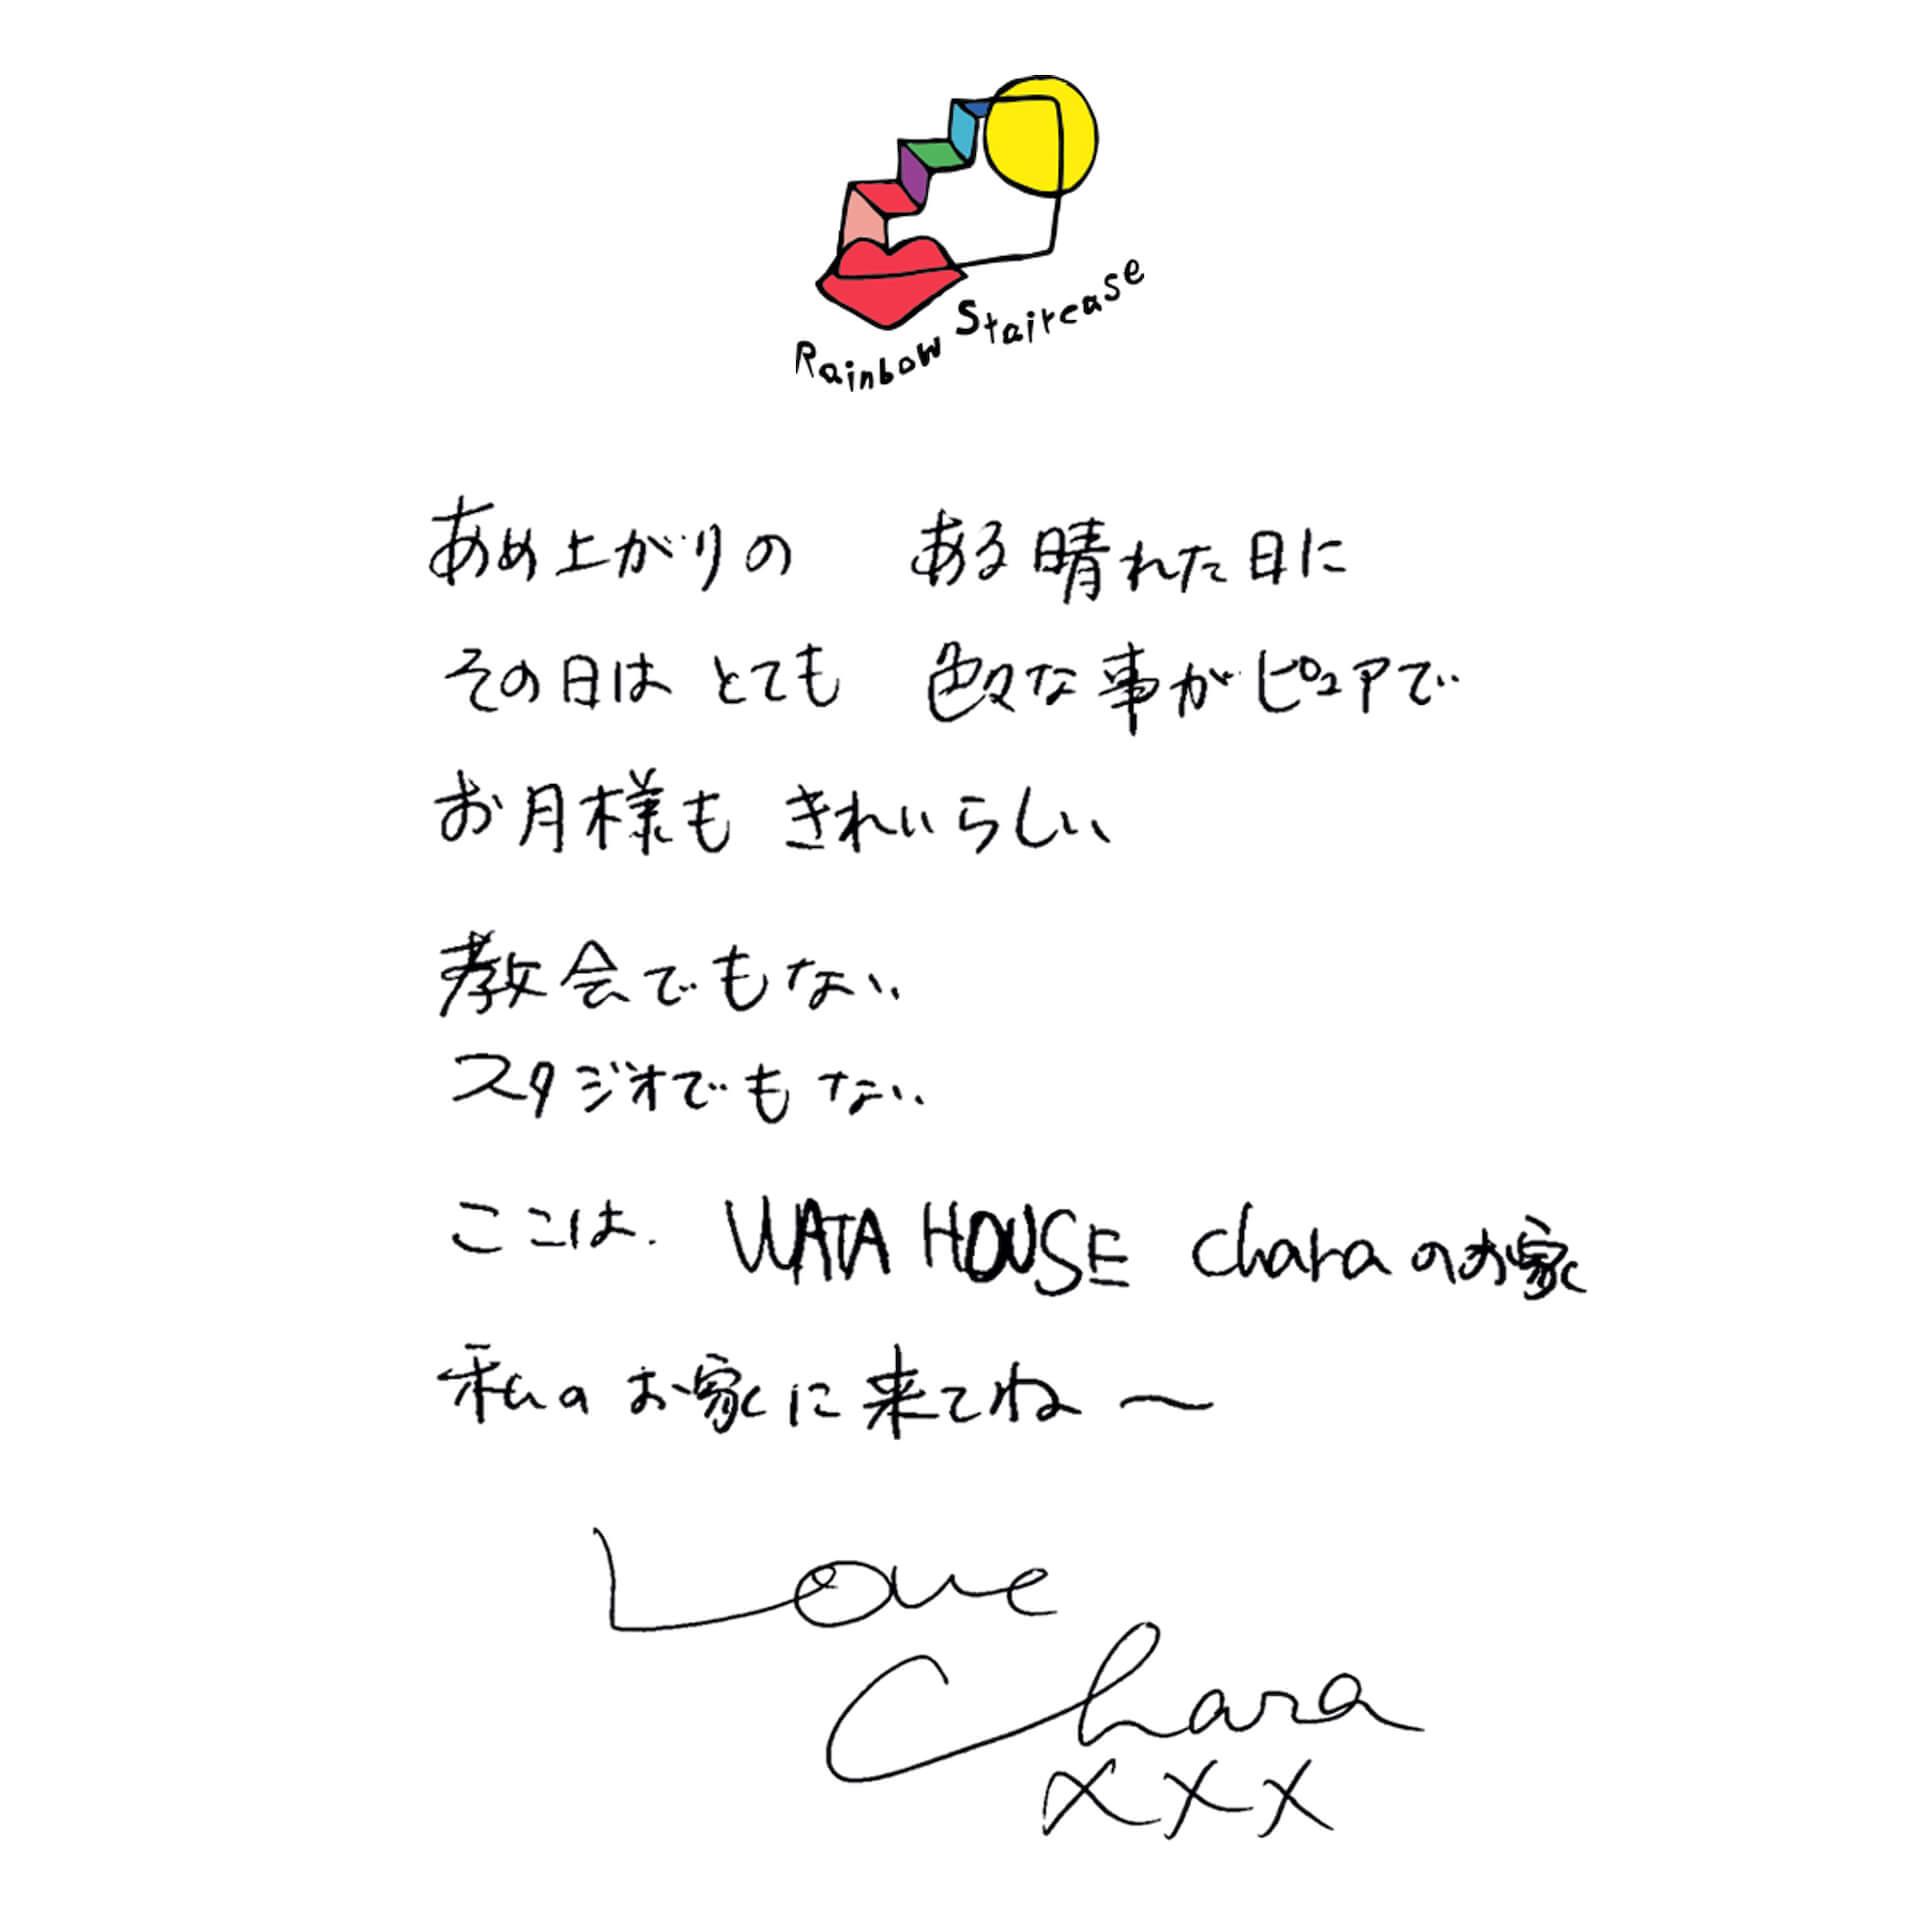 Charaの配信プログラム「Rainbow Staircase」のティザー映像が公開!イマチケでのライブ配信も決定 music200601_chara_rainbowstaircase_02-1